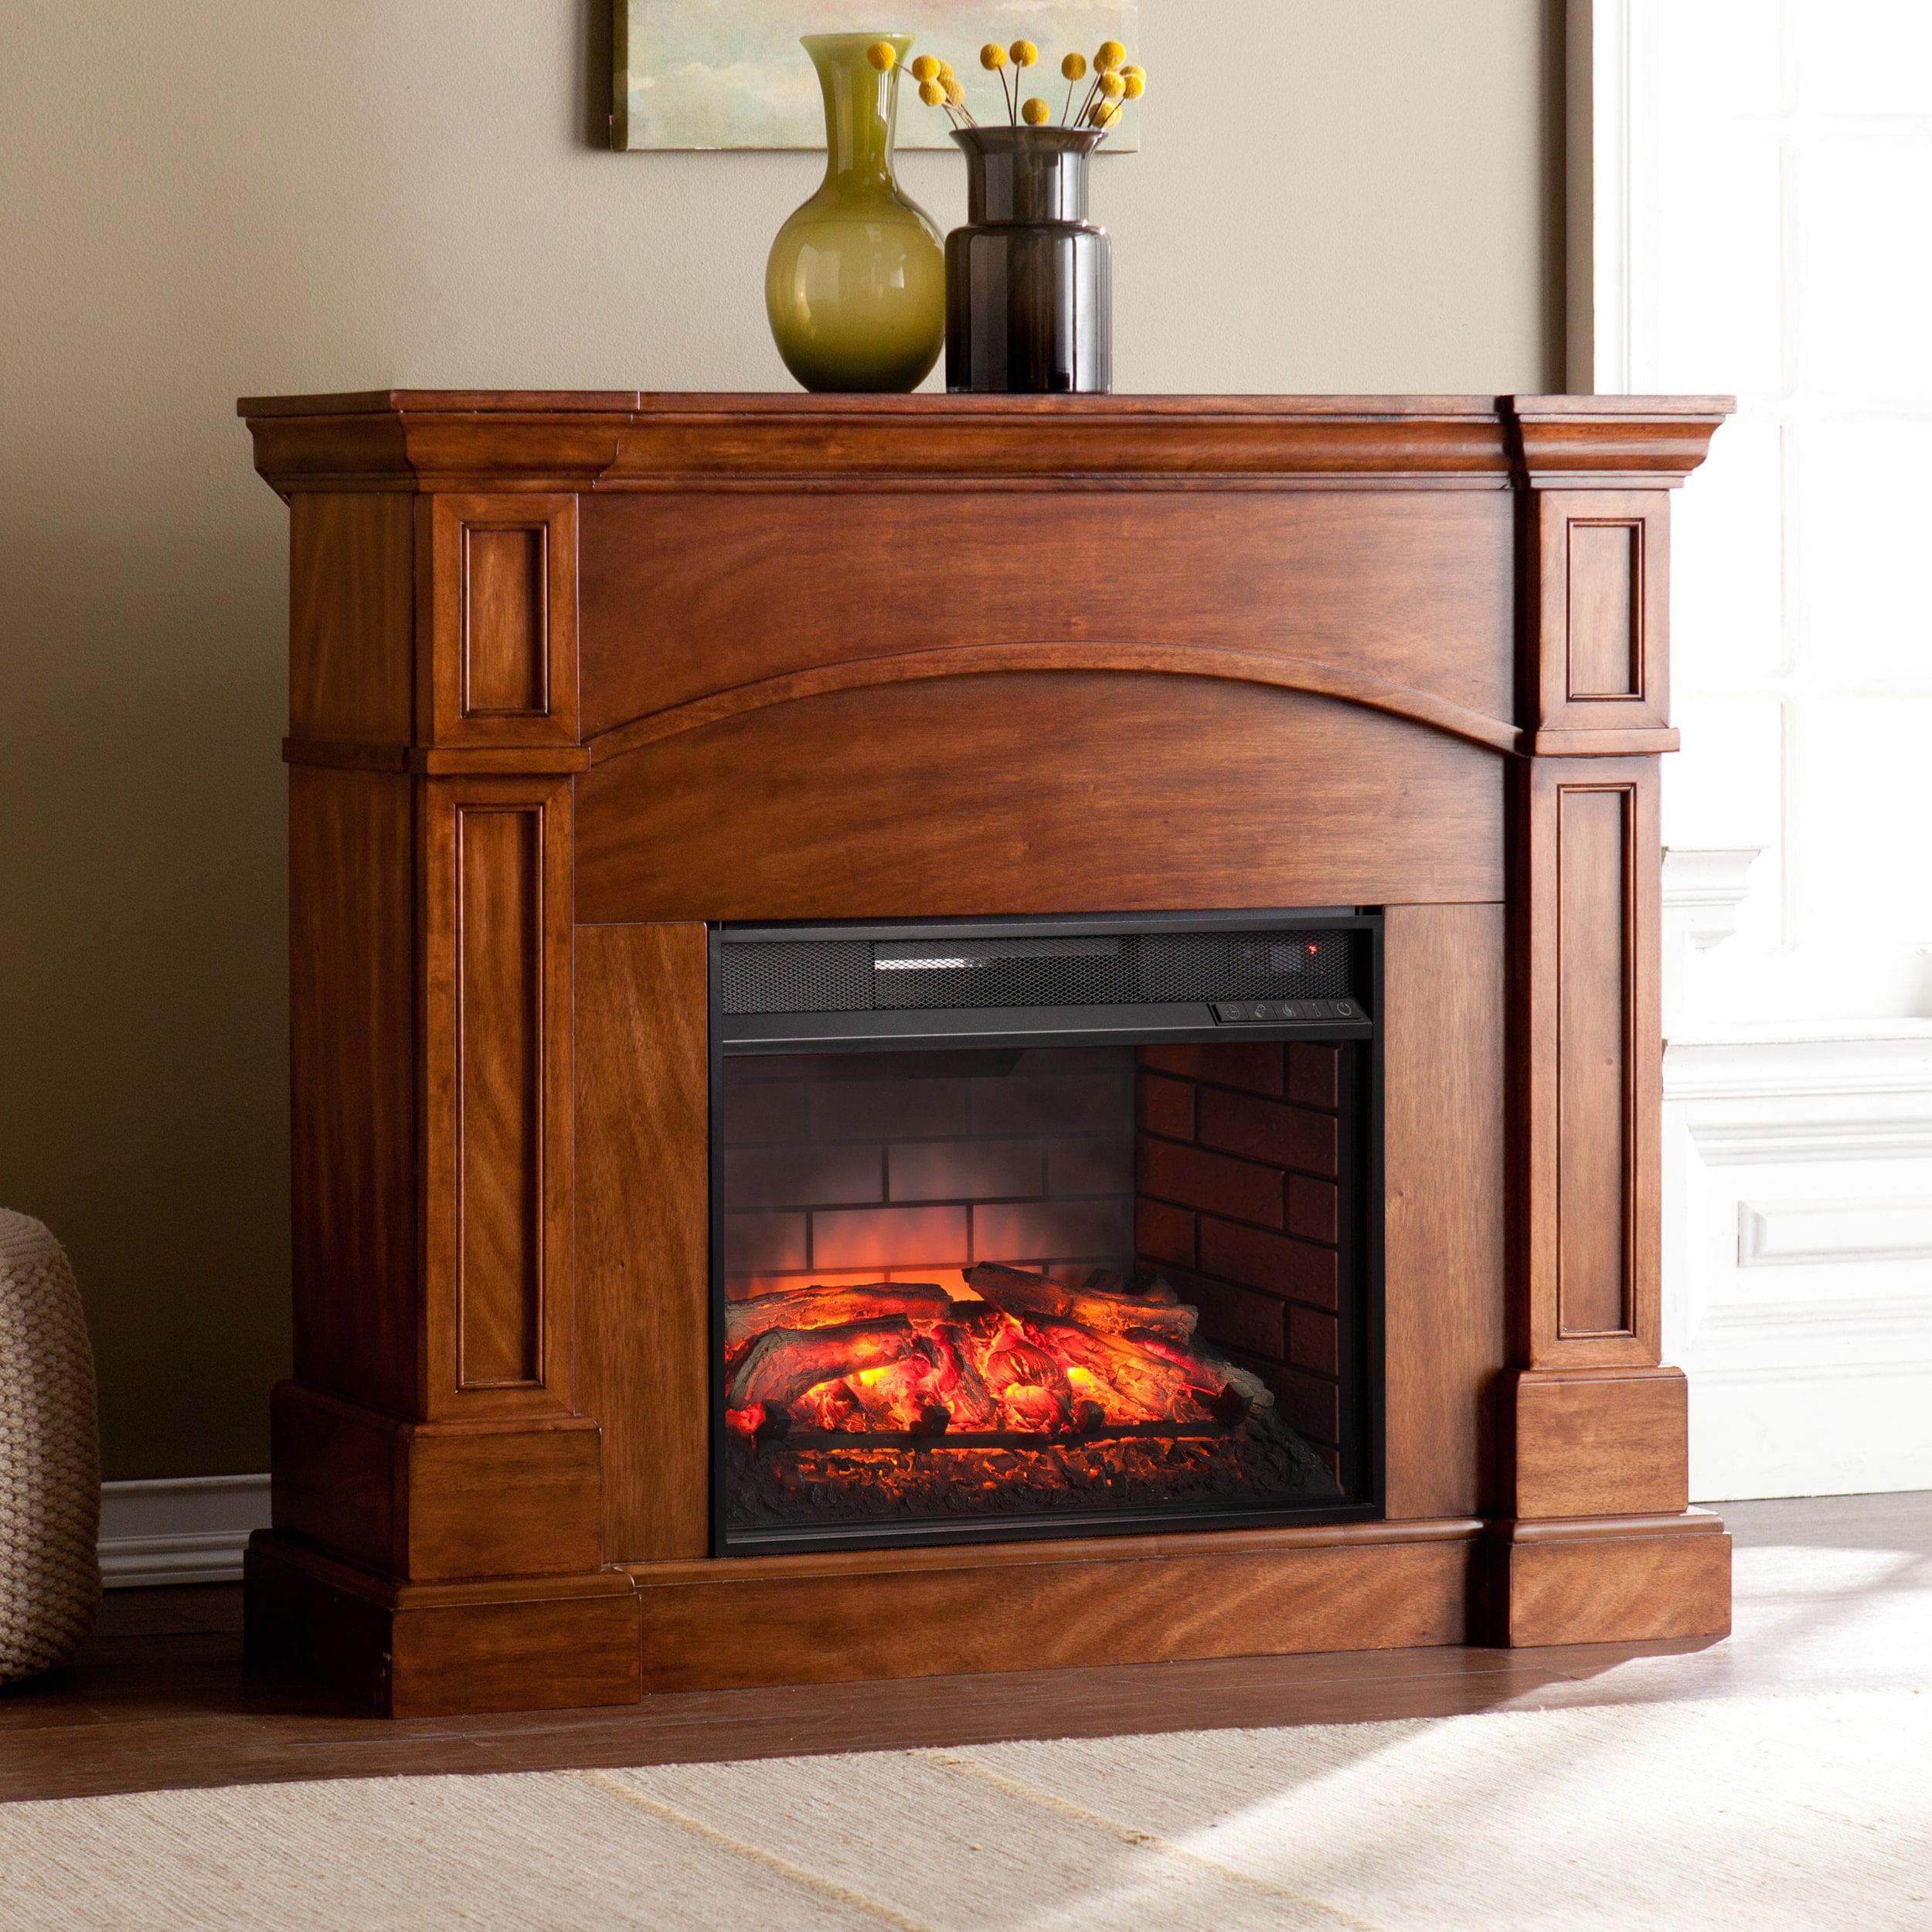 Southern Enterprises Harper Blvd Hawkins Oak Saddle Corner Convertible Infrared Electric Fireplace